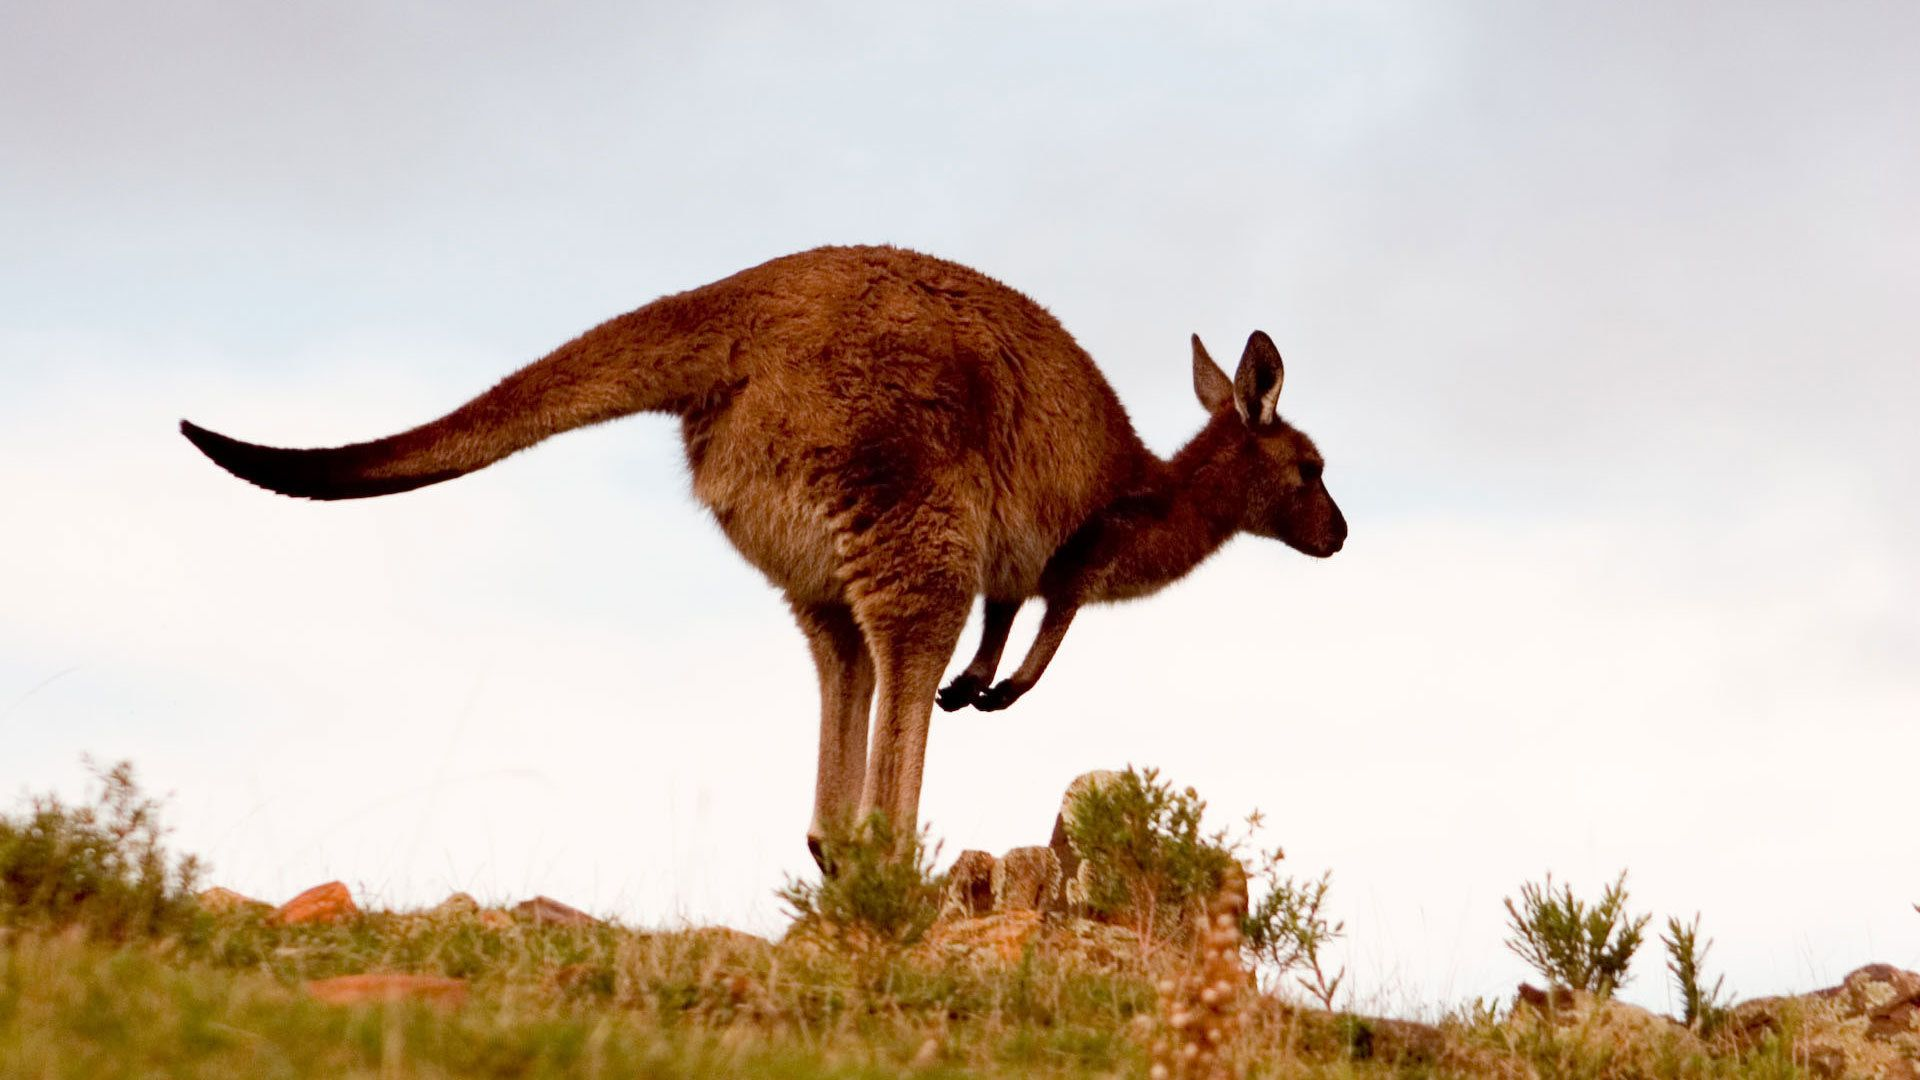 5-Day Adelaide & Kangaroo Island Discovery Tour